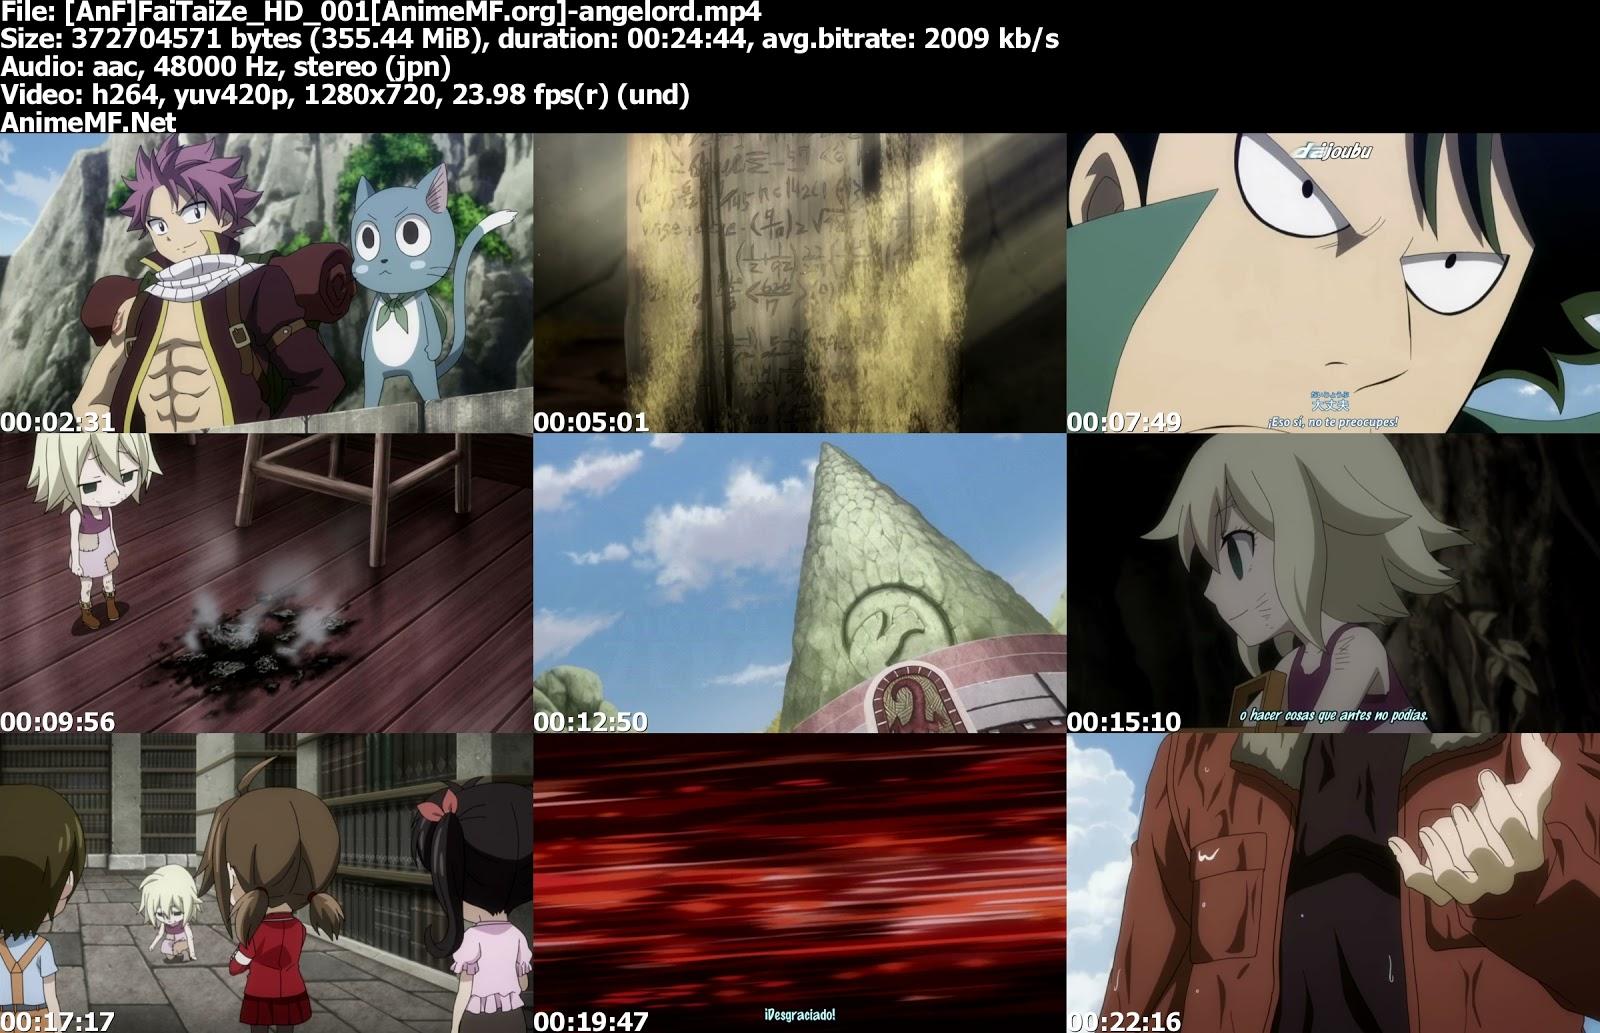 Fairy Tail S2